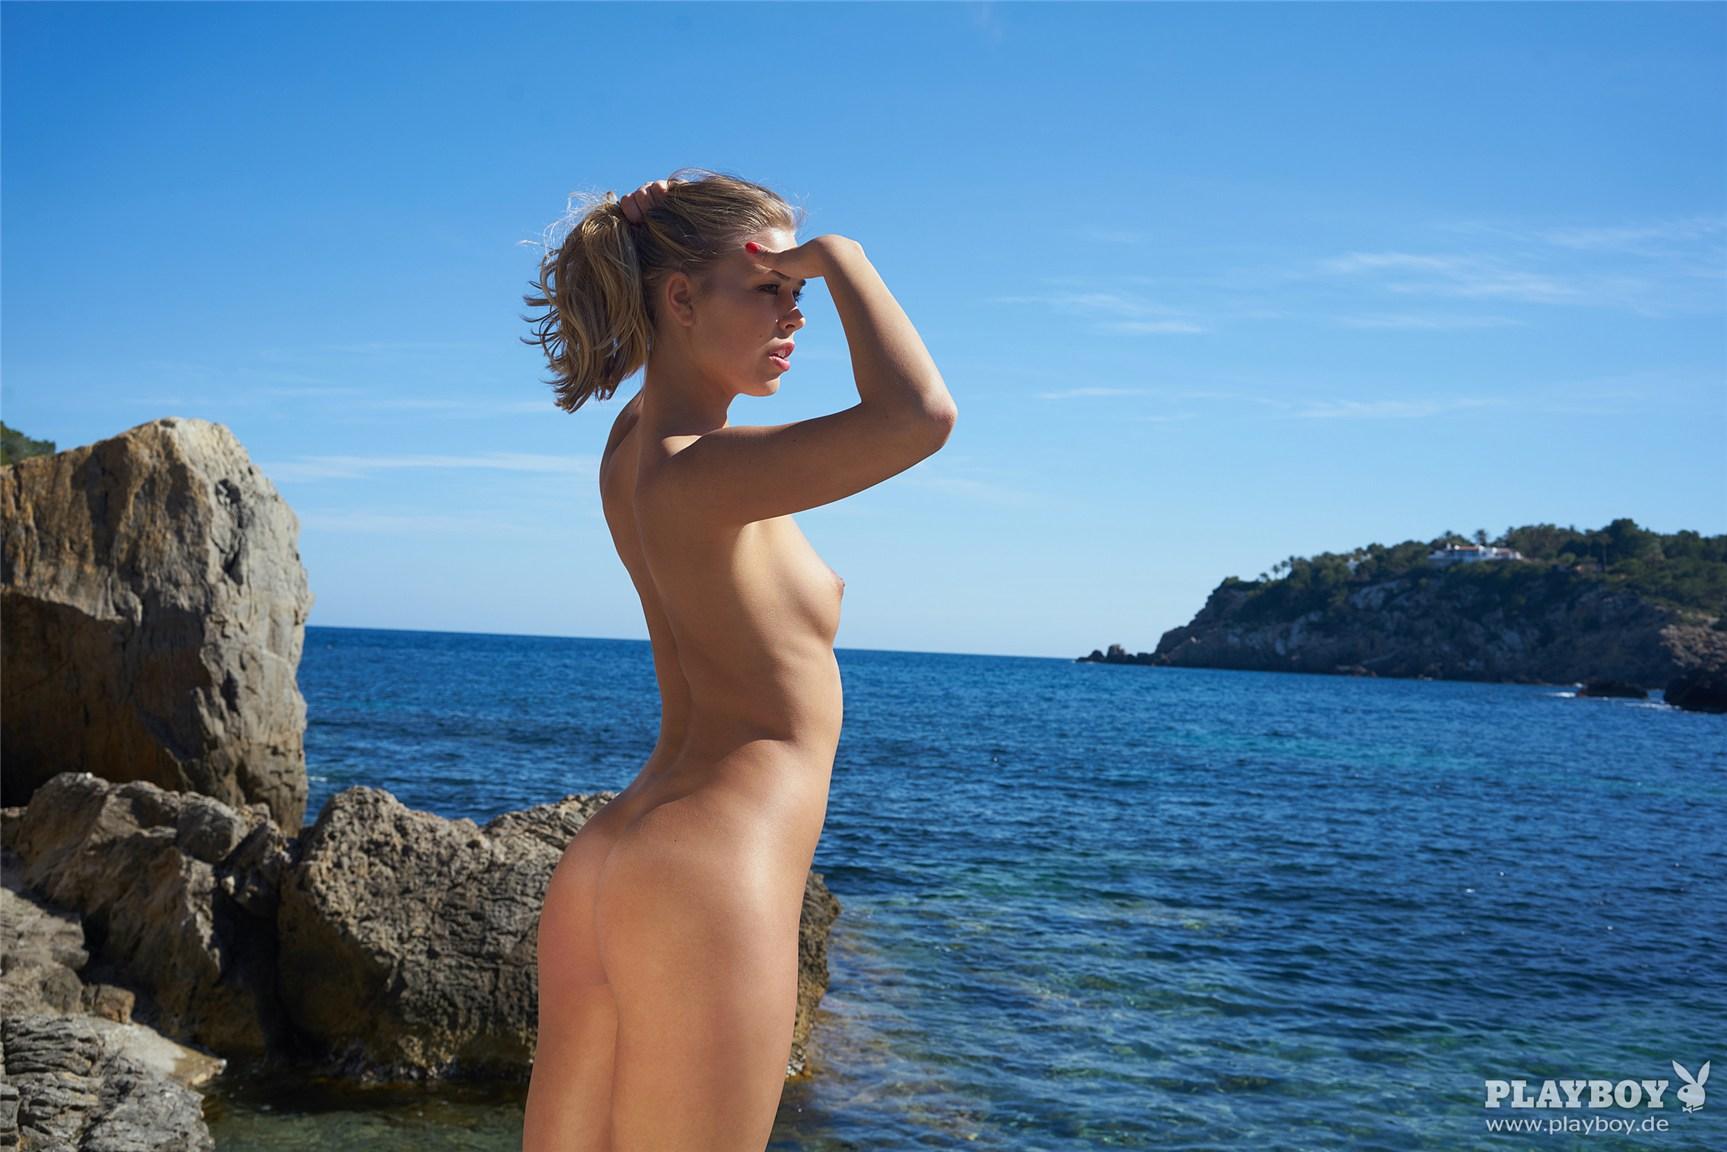 Девушка месяца Шарлотта Глижински / Charlotte Gliszczynski - Playboy Germany september 2016 playmate